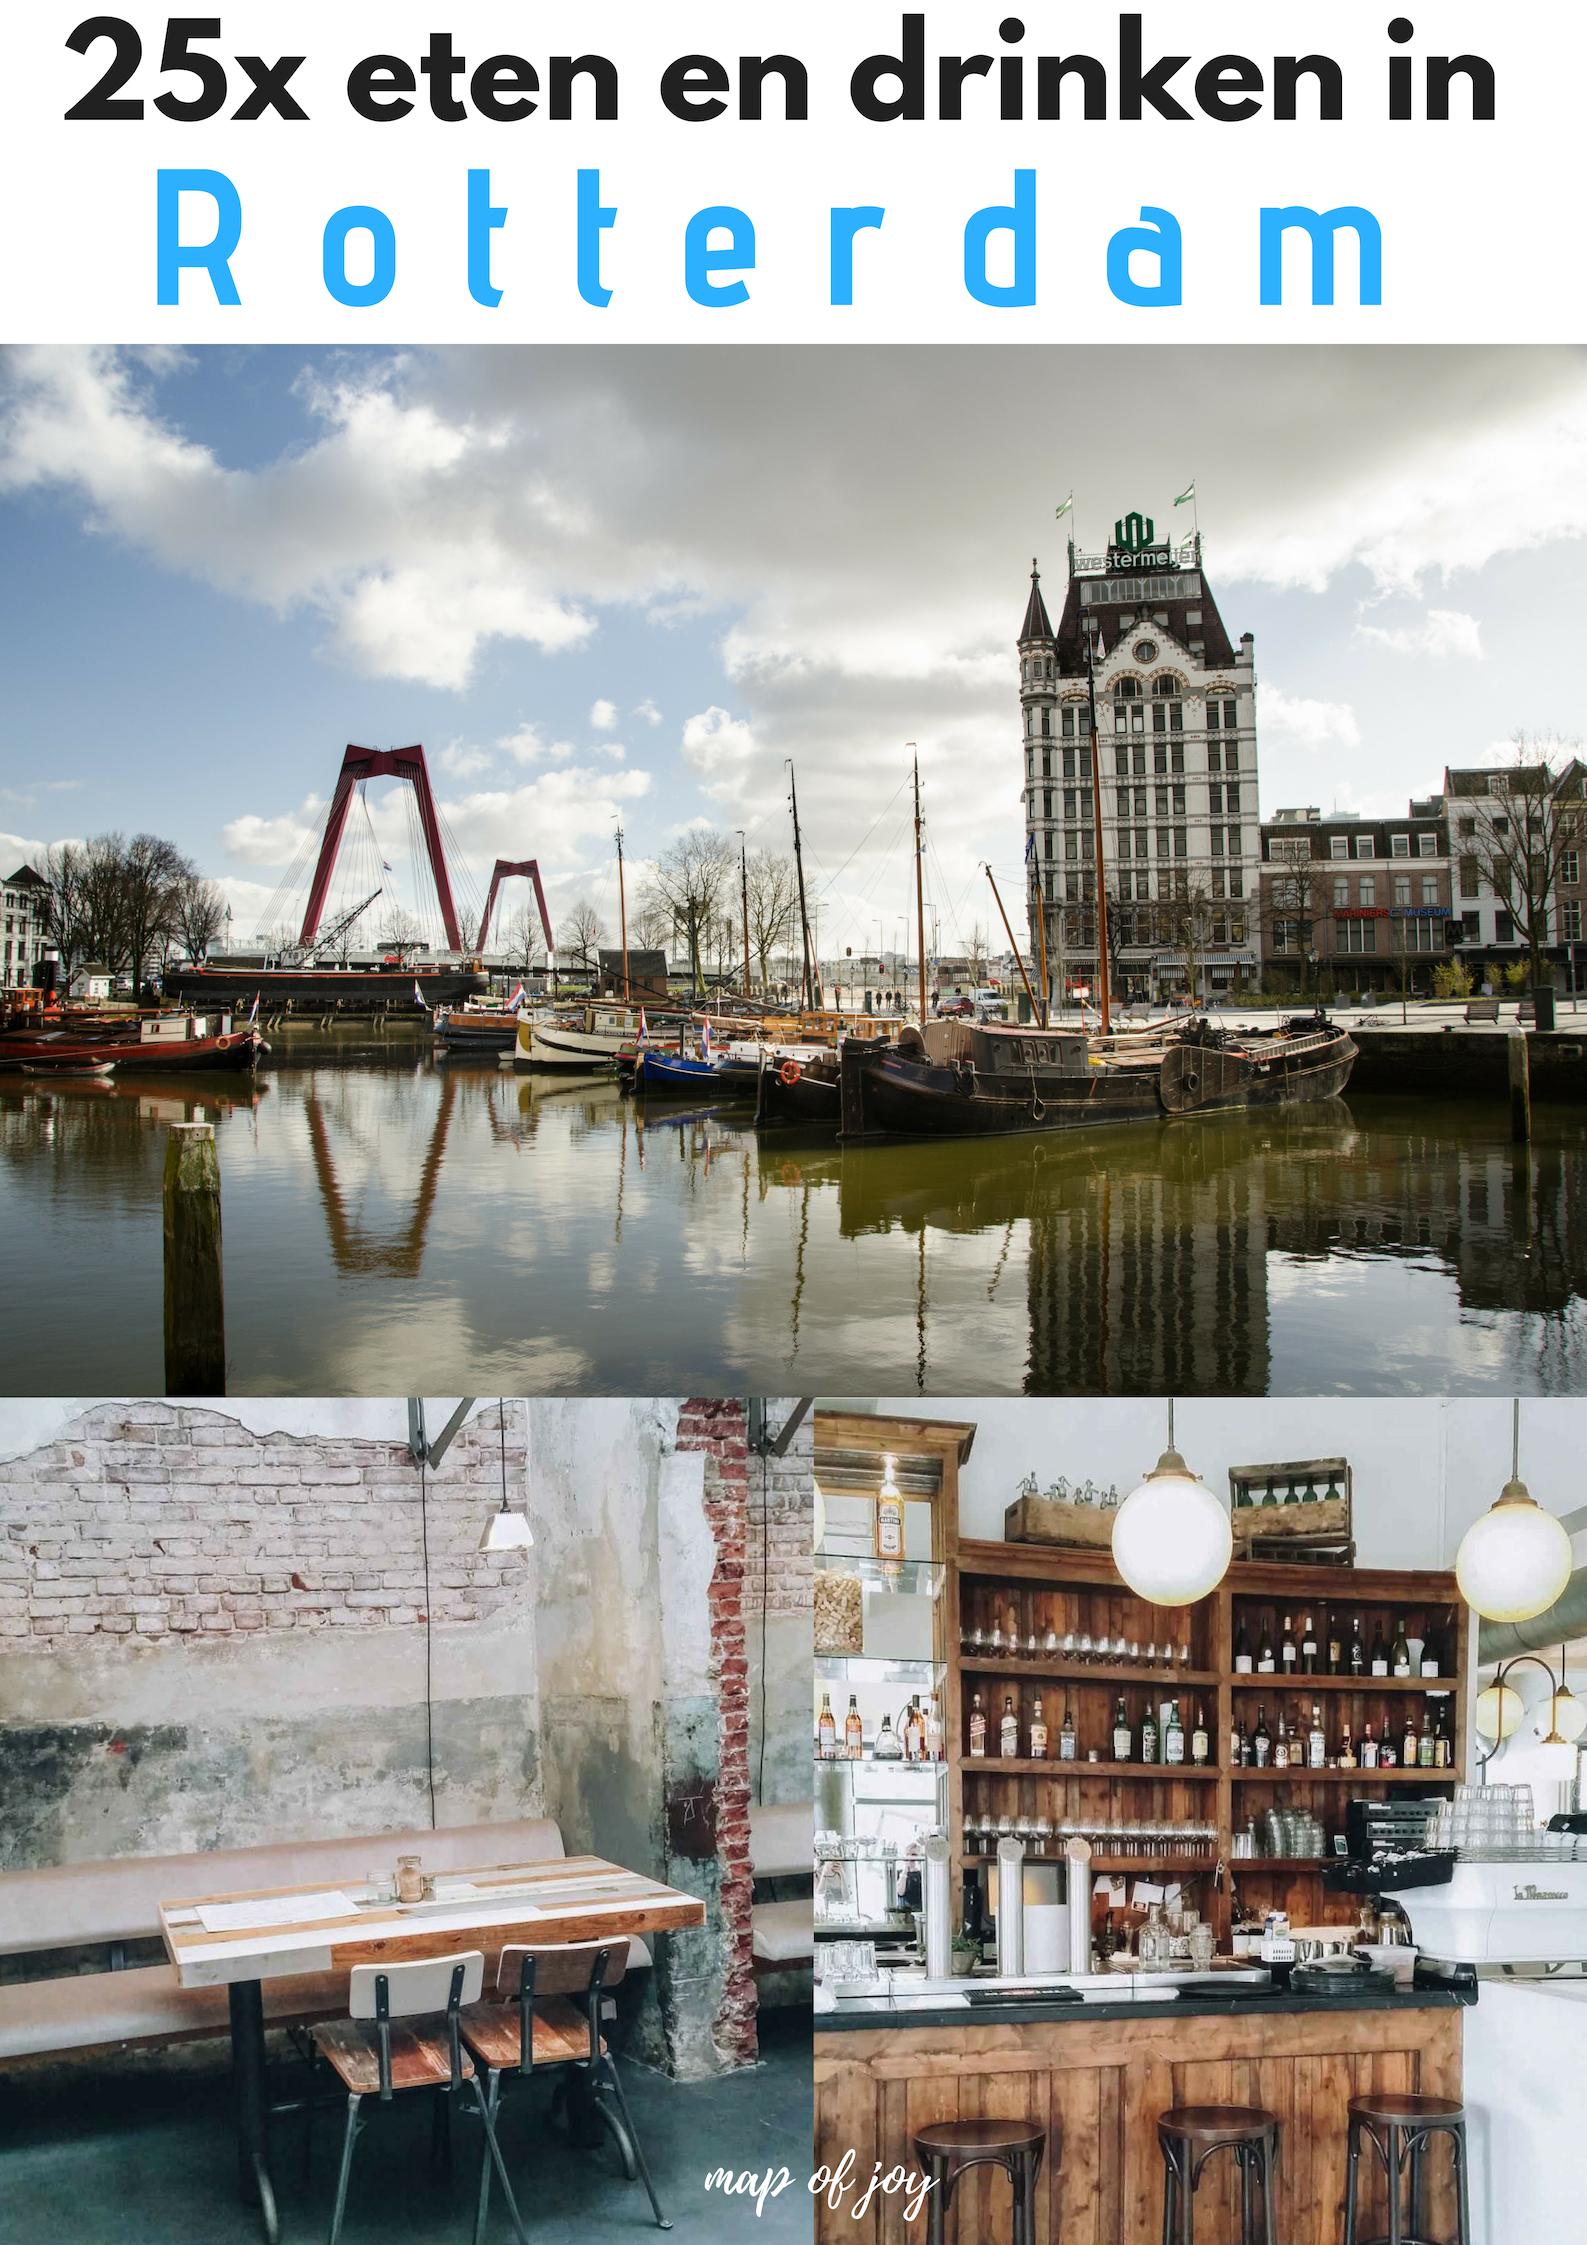 25x eten en drinken in Rotterdam - Map of Joy